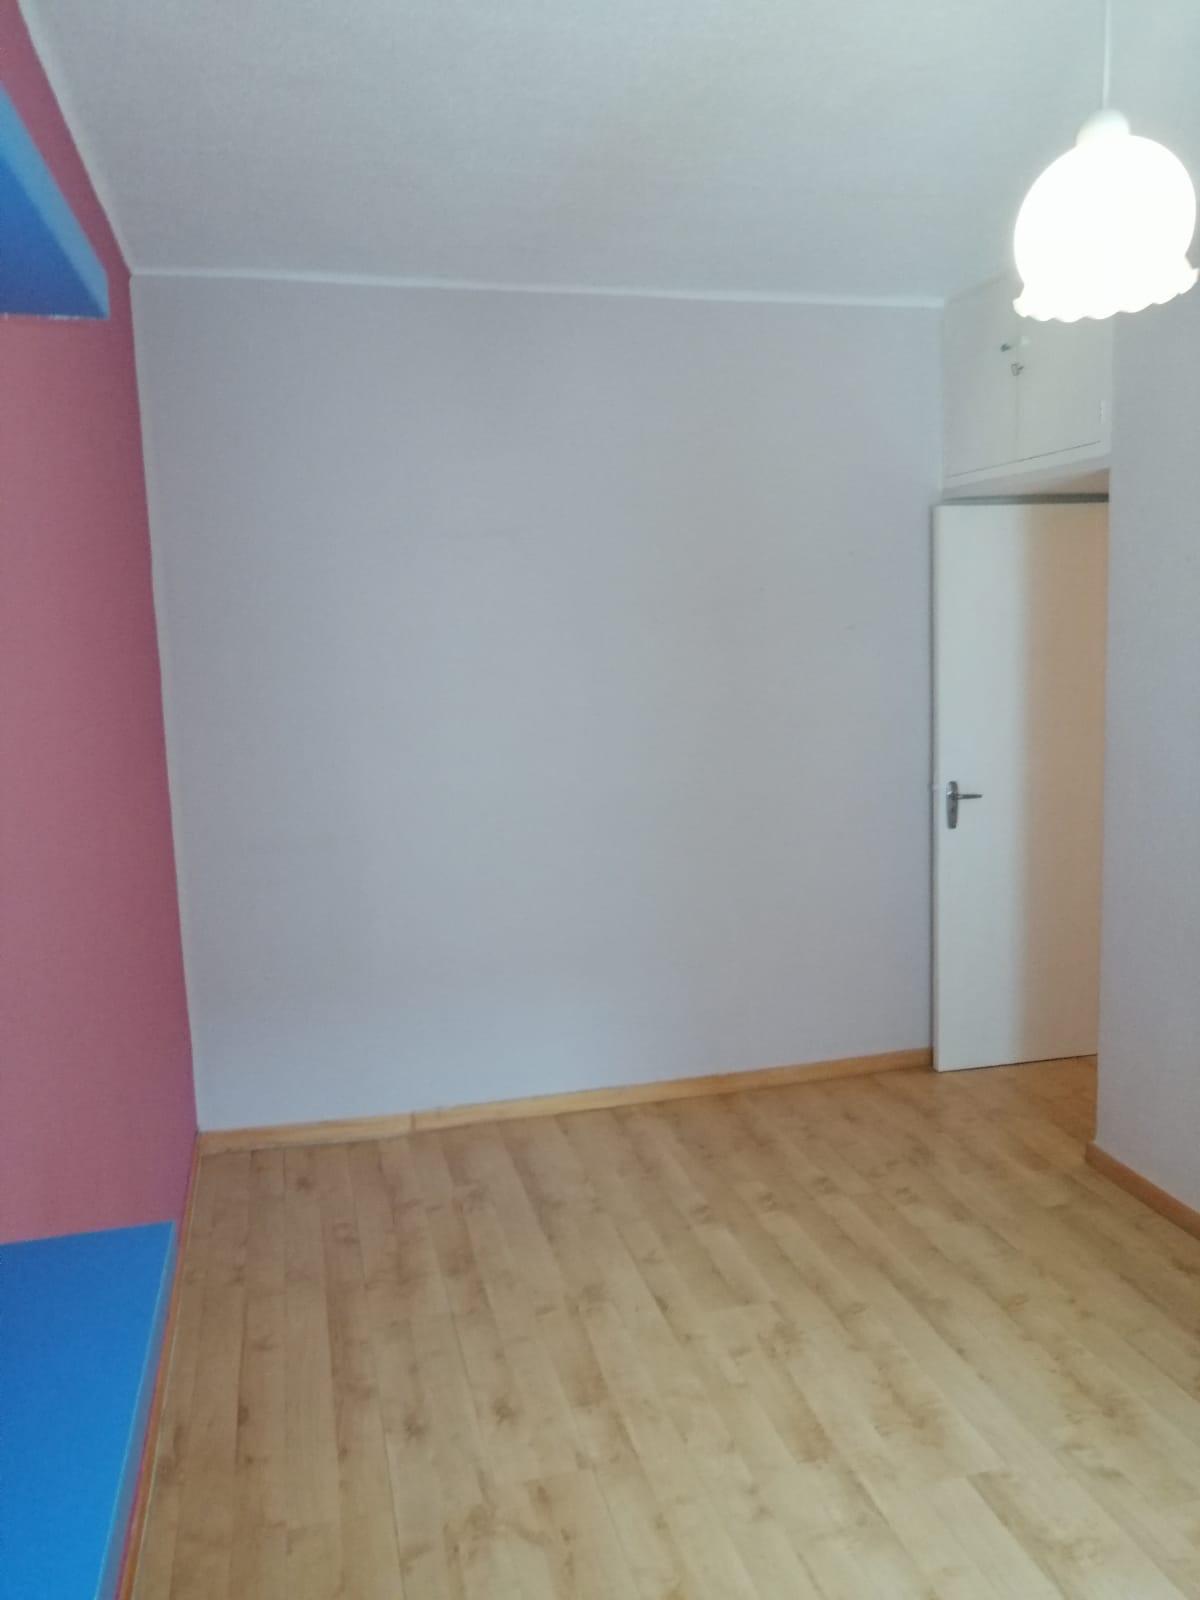 Piso de tres dormitorios junto a corte inglés (REF: 53) - foto 7 f148ae19-cacd-4fe6-aa25-5bd09d3655c2.jpg